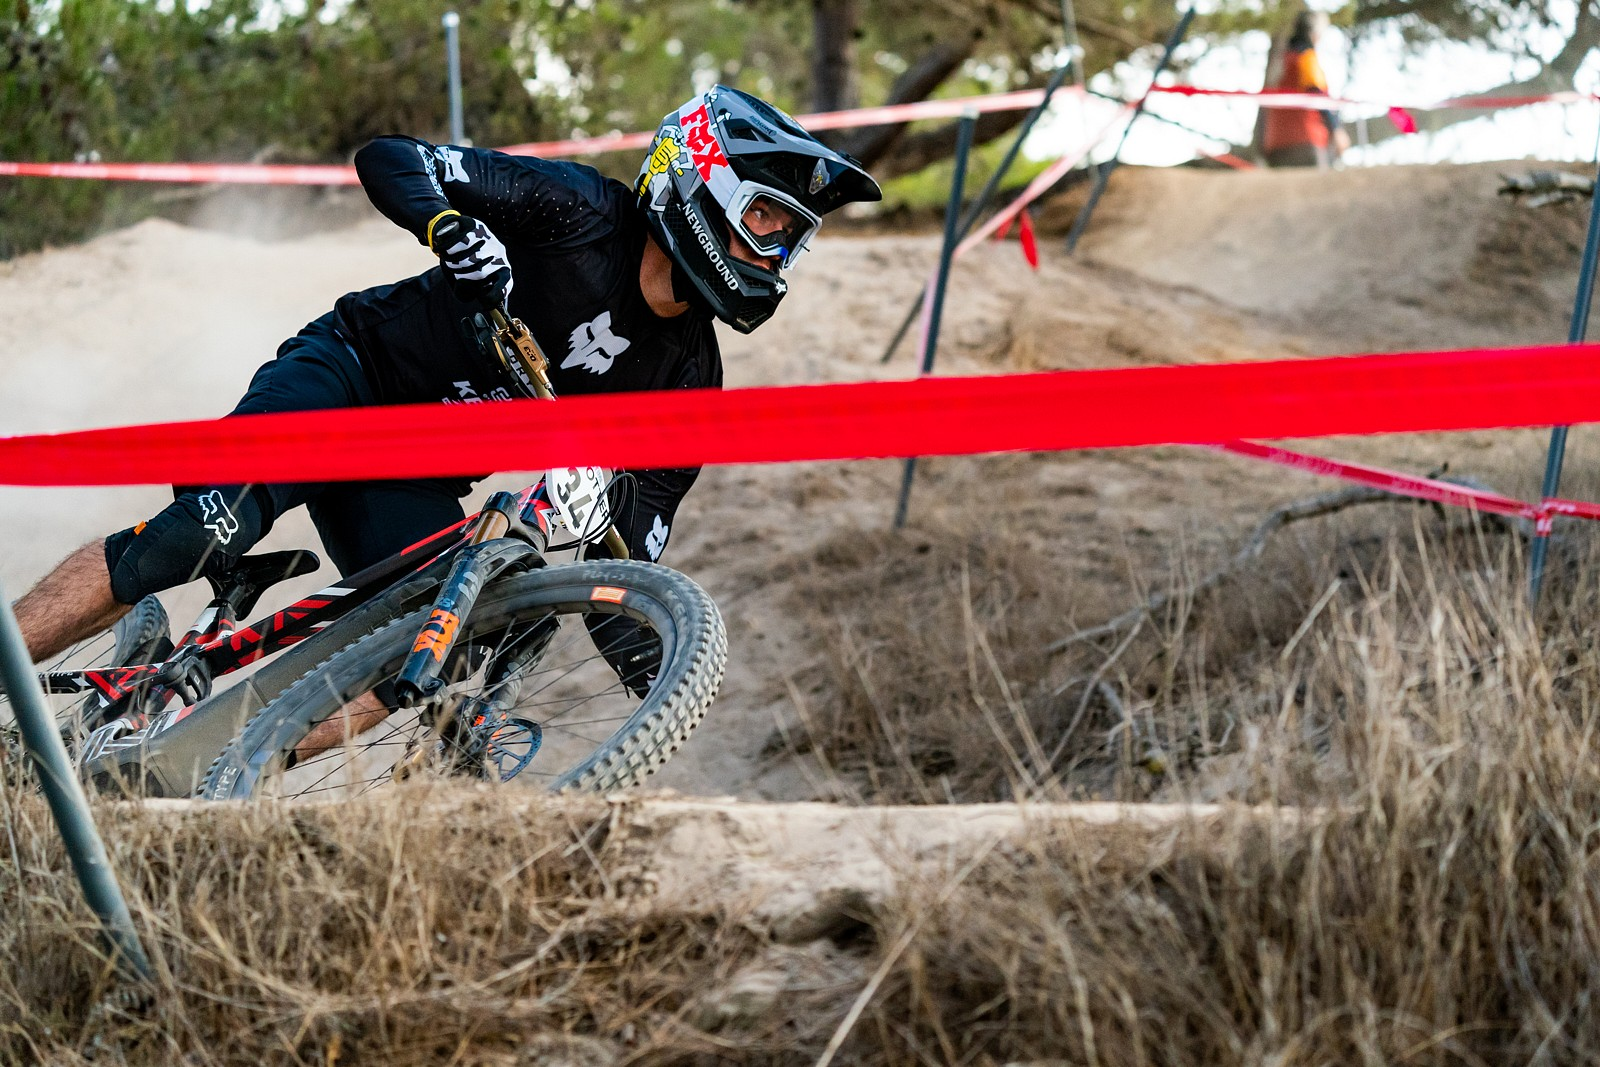 Neko Mulally - Zuestman - Mountain Biking Pictures - Vital MTB